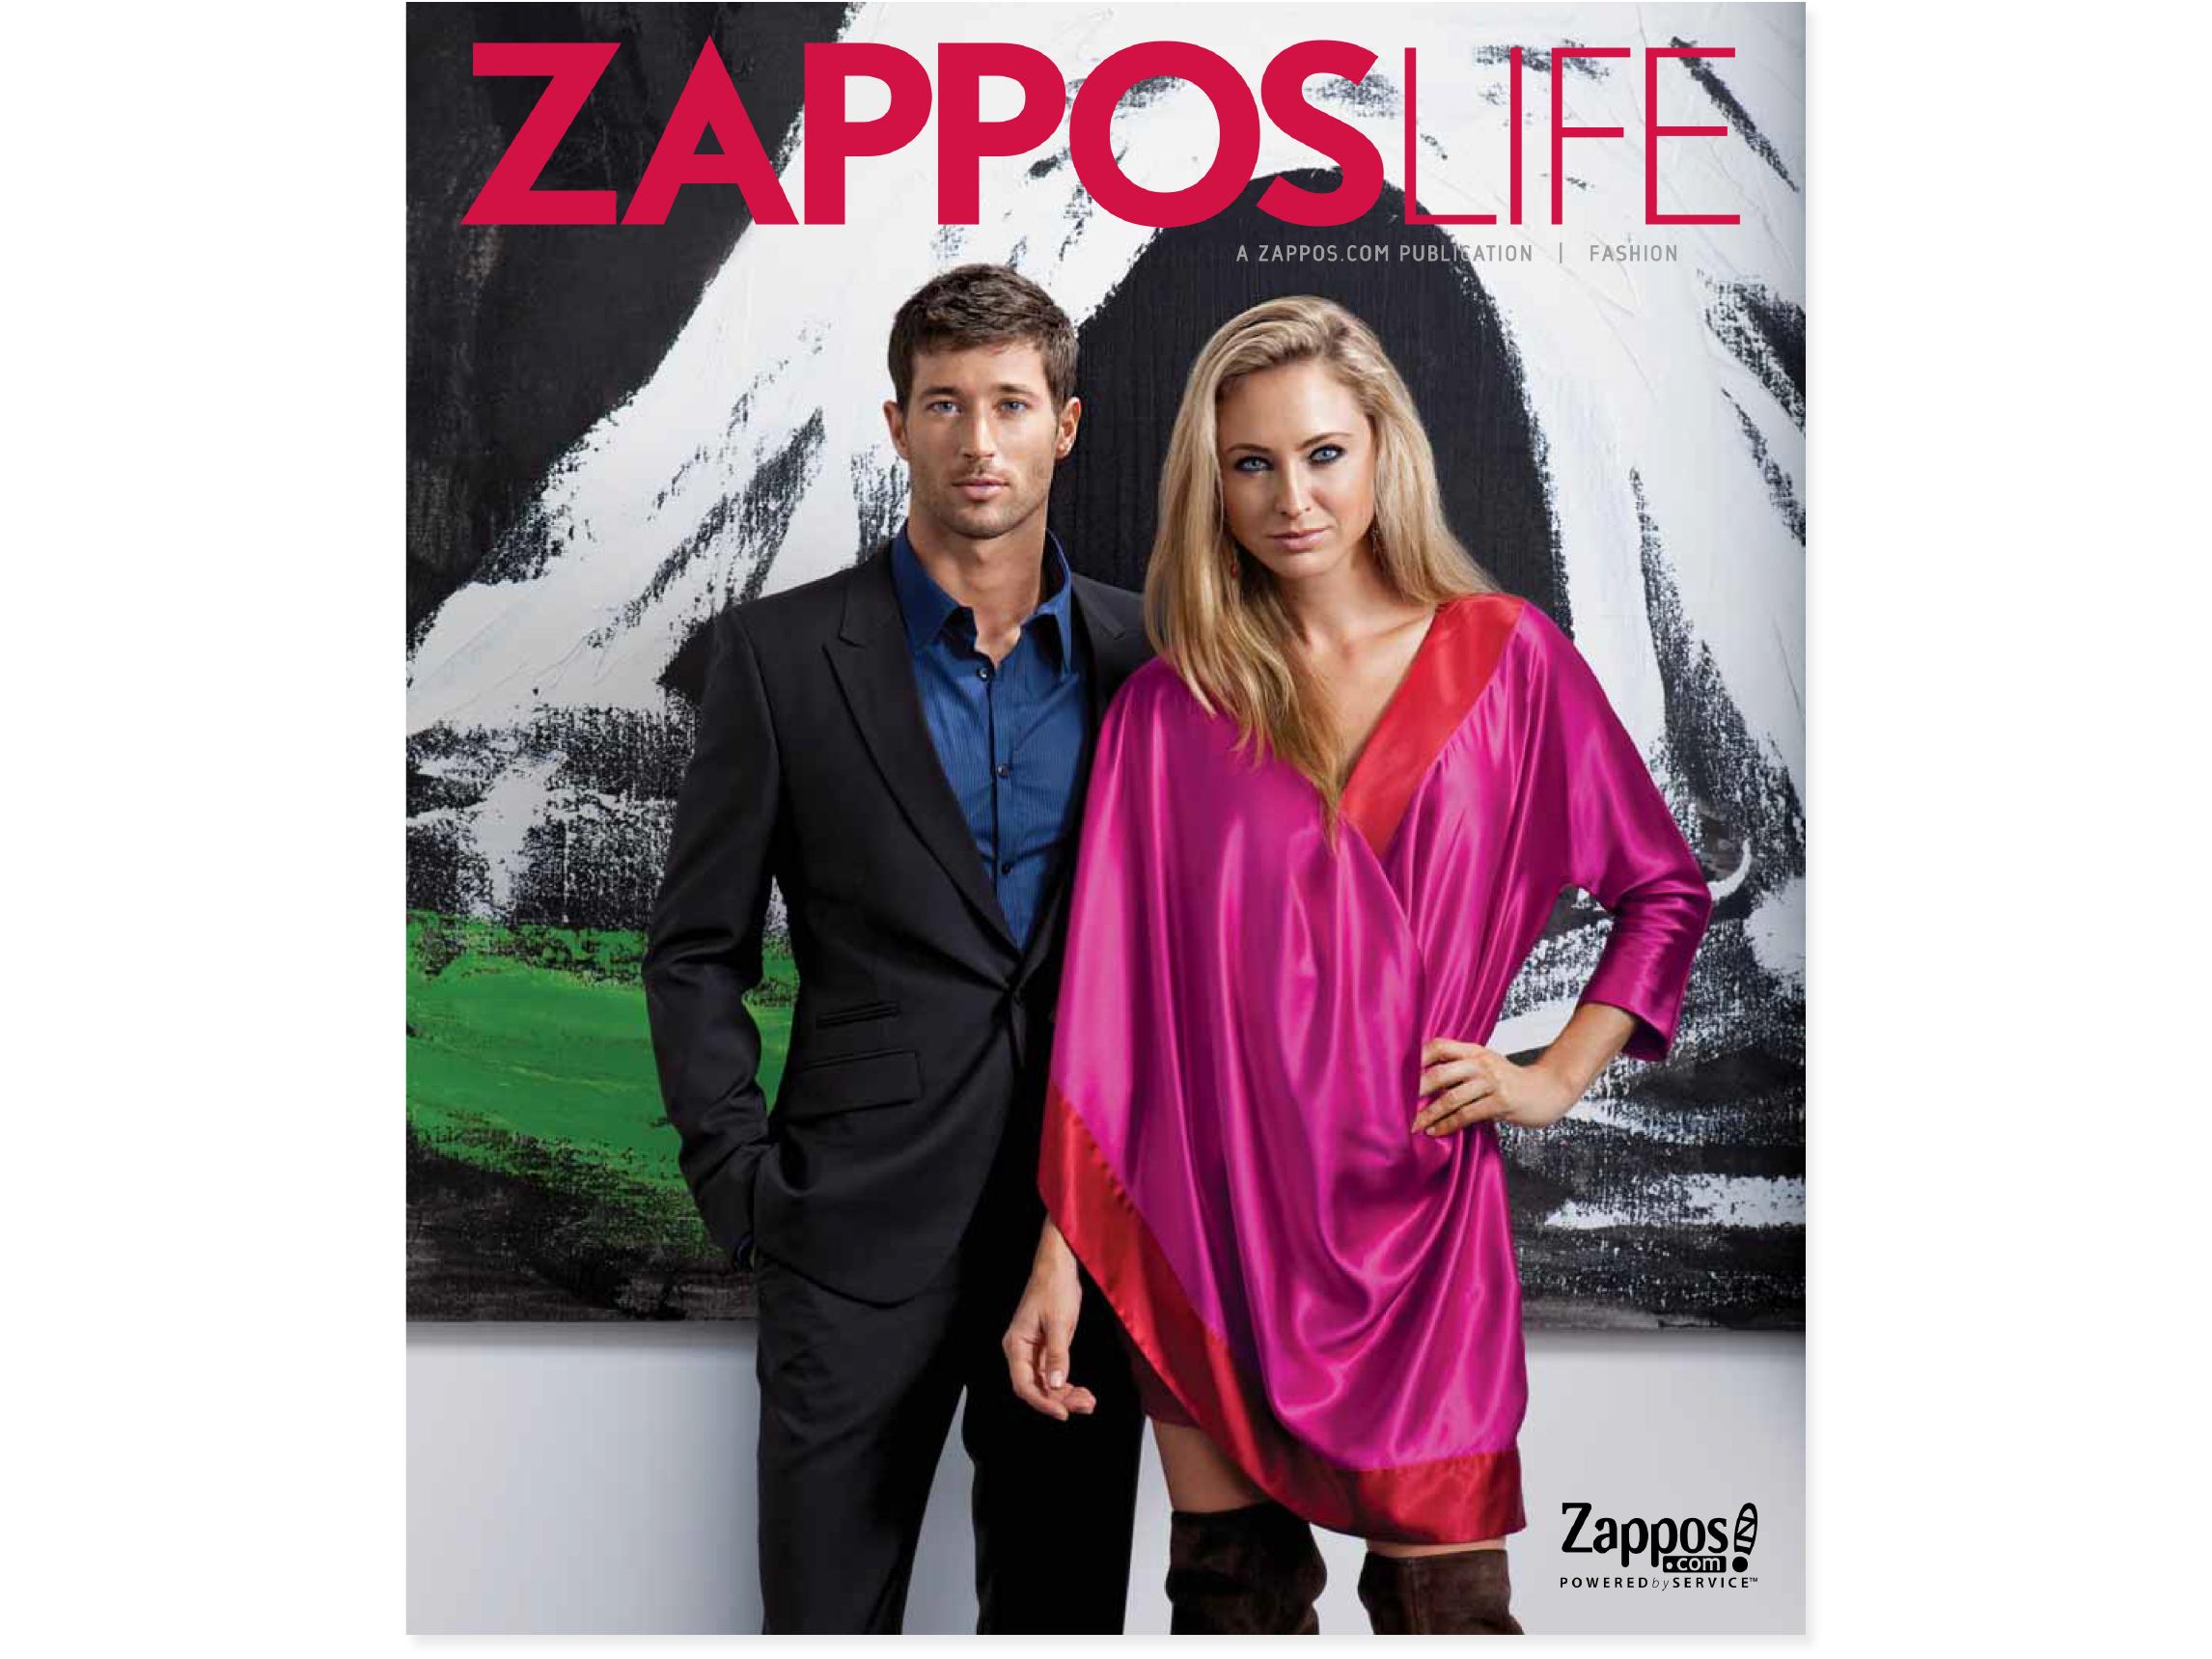 DMD_Zappos Fashion_150_4.jpg